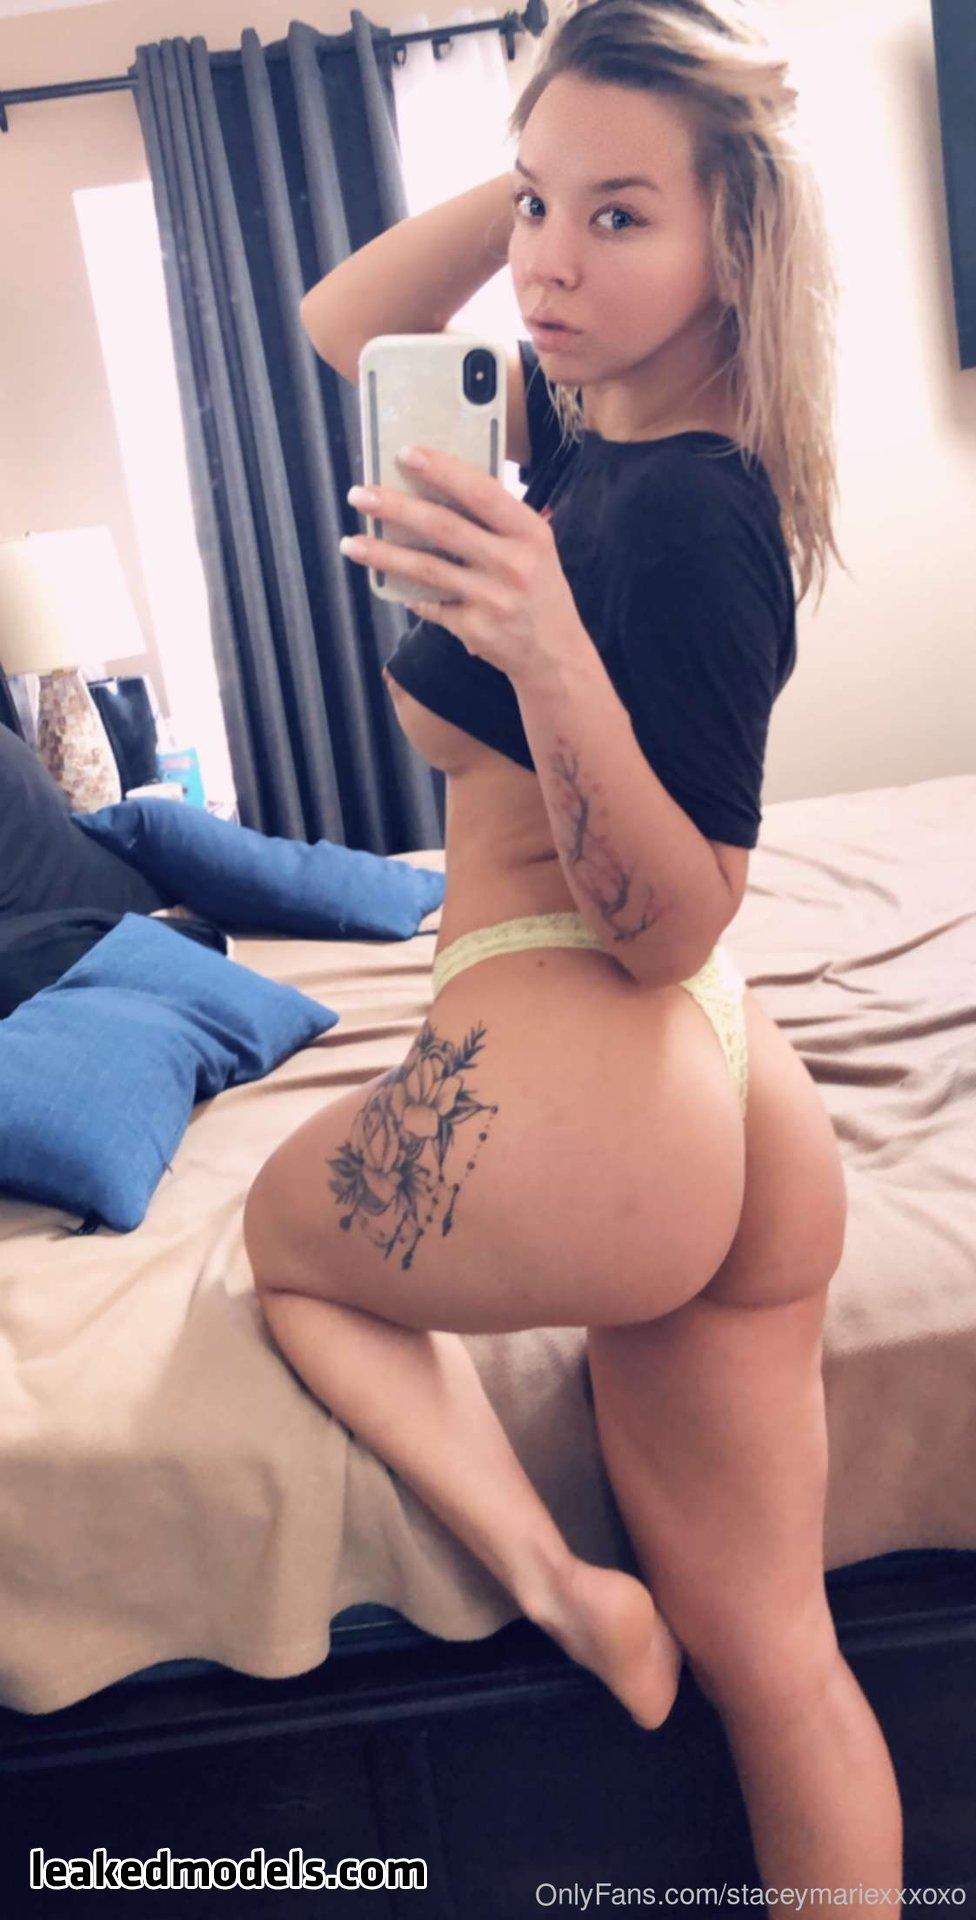 Staceyxxxoxo OnlyFans Nude Leaks (27 Photos)